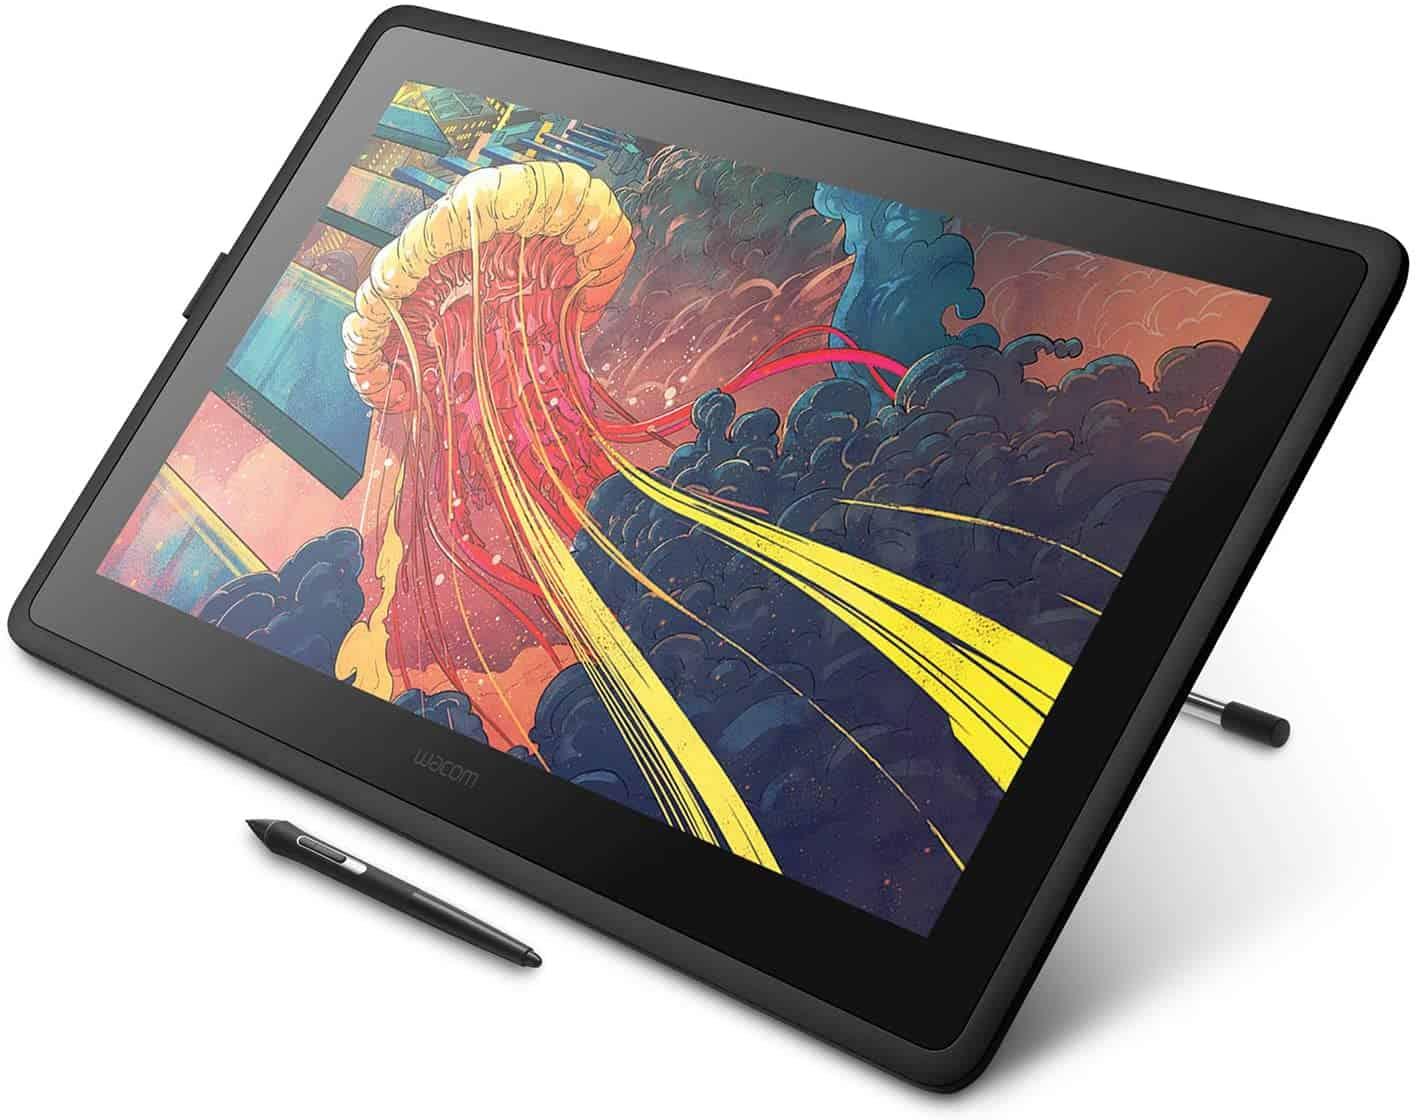 Wacom Cintiq 22 Drawing Tablet with HD Screen